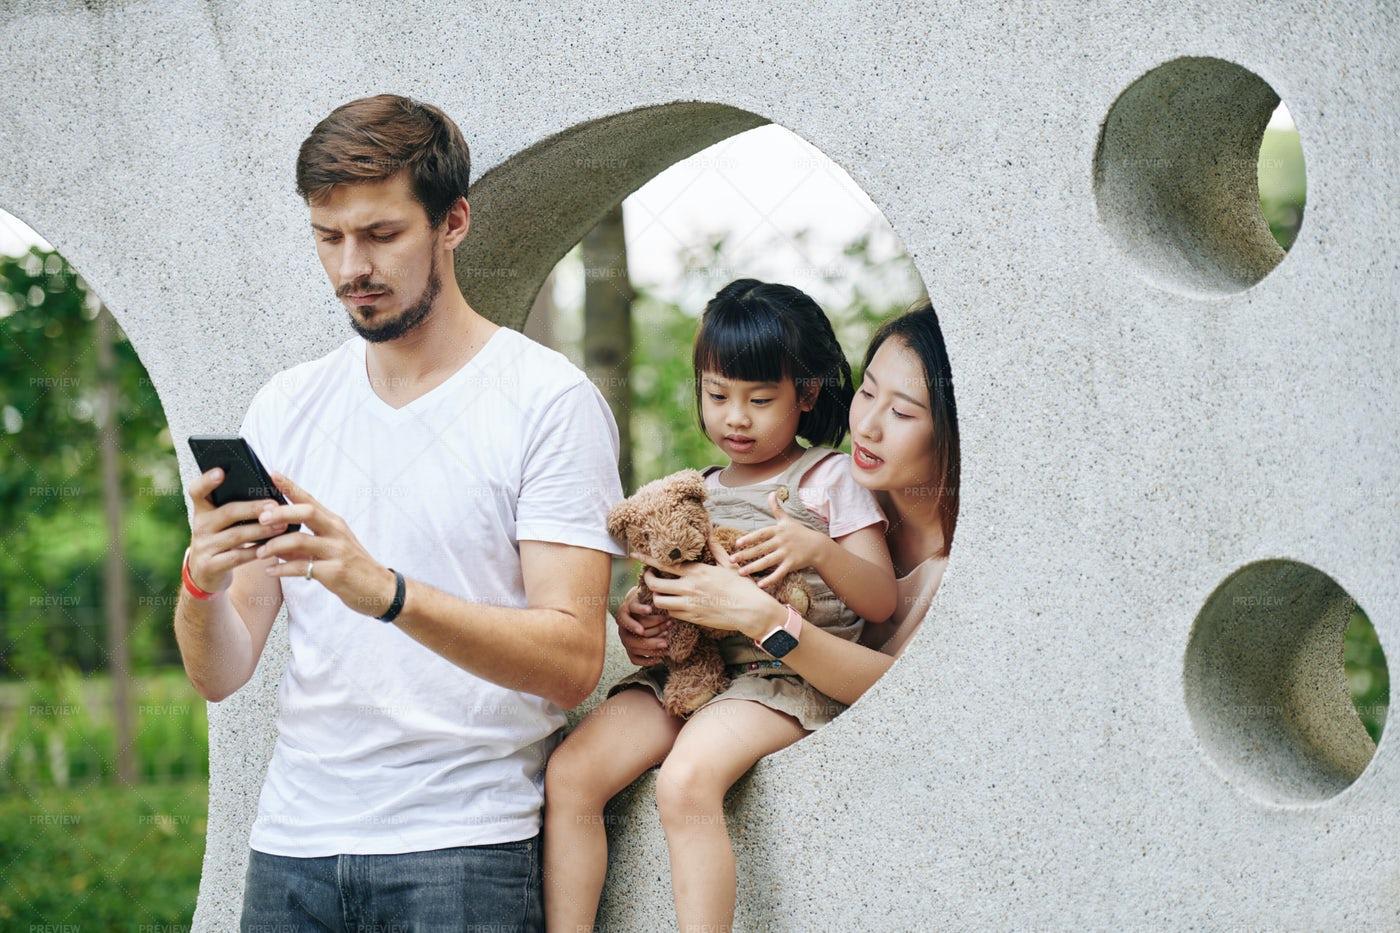 Man Texting At Playground: Stock Photos